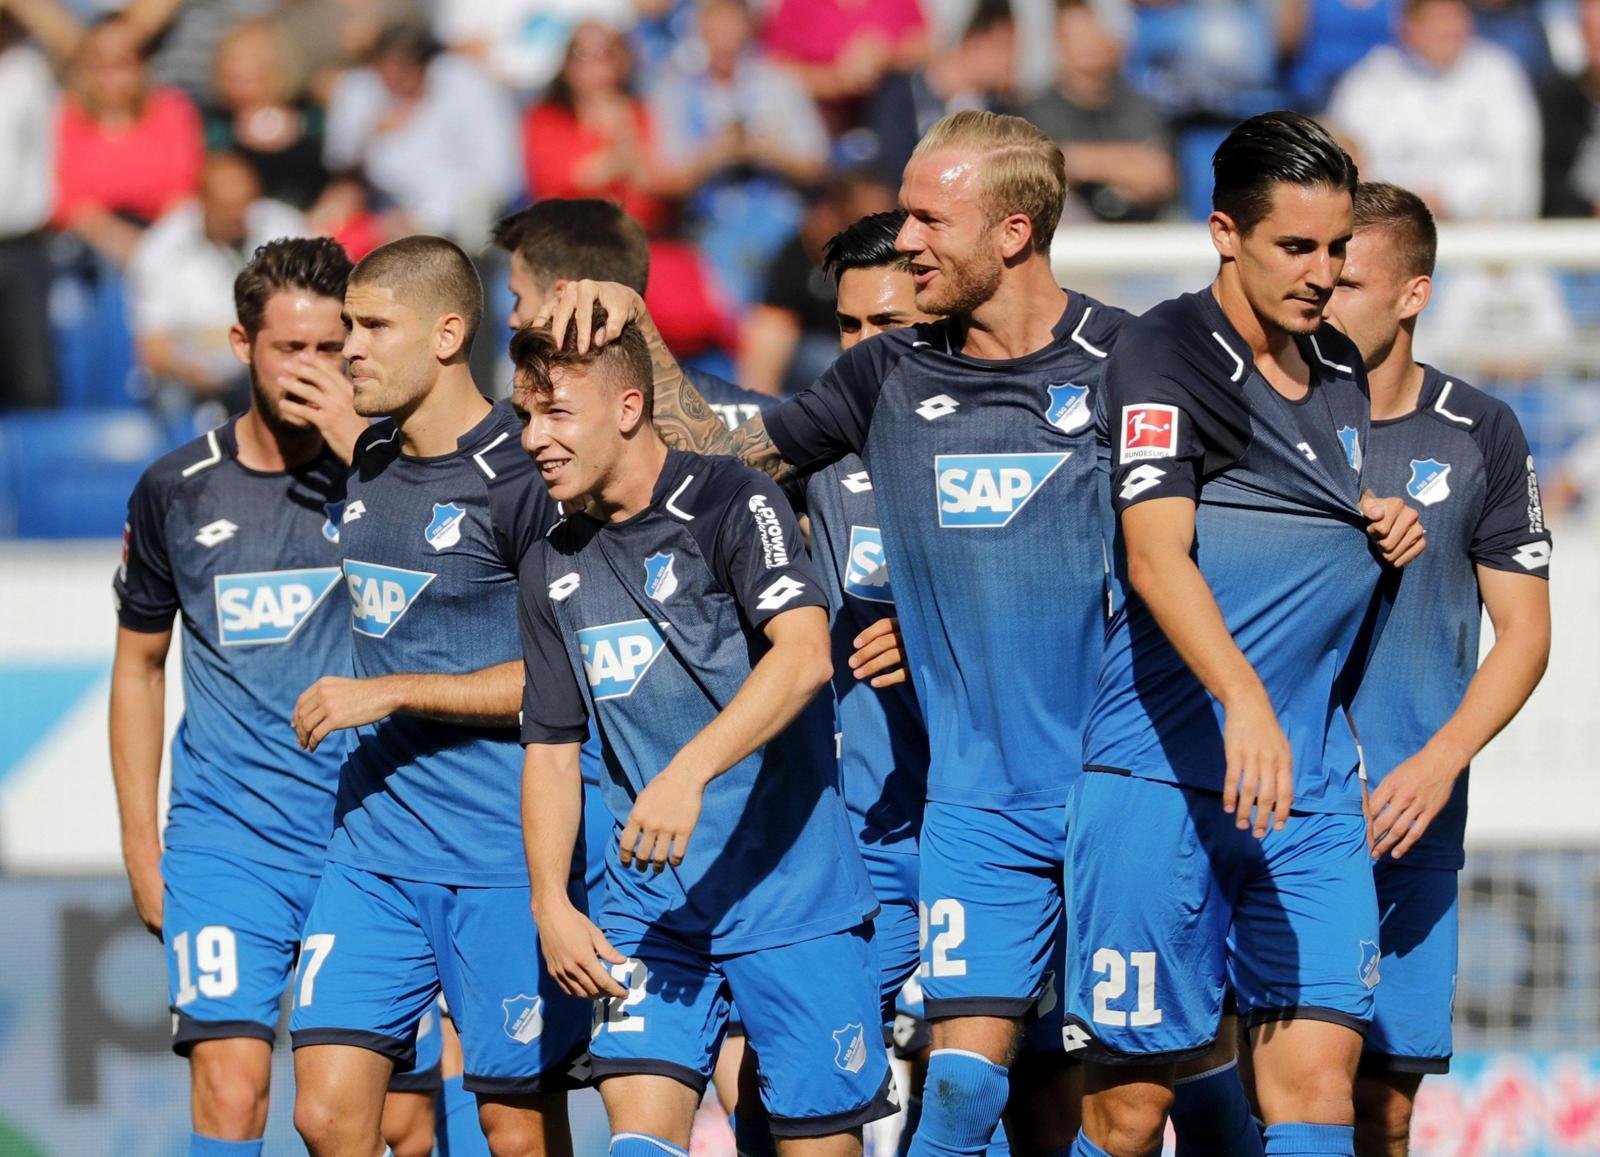 Hoffenheim sogna: batte lo Schalke 2-0 e vola in testa!